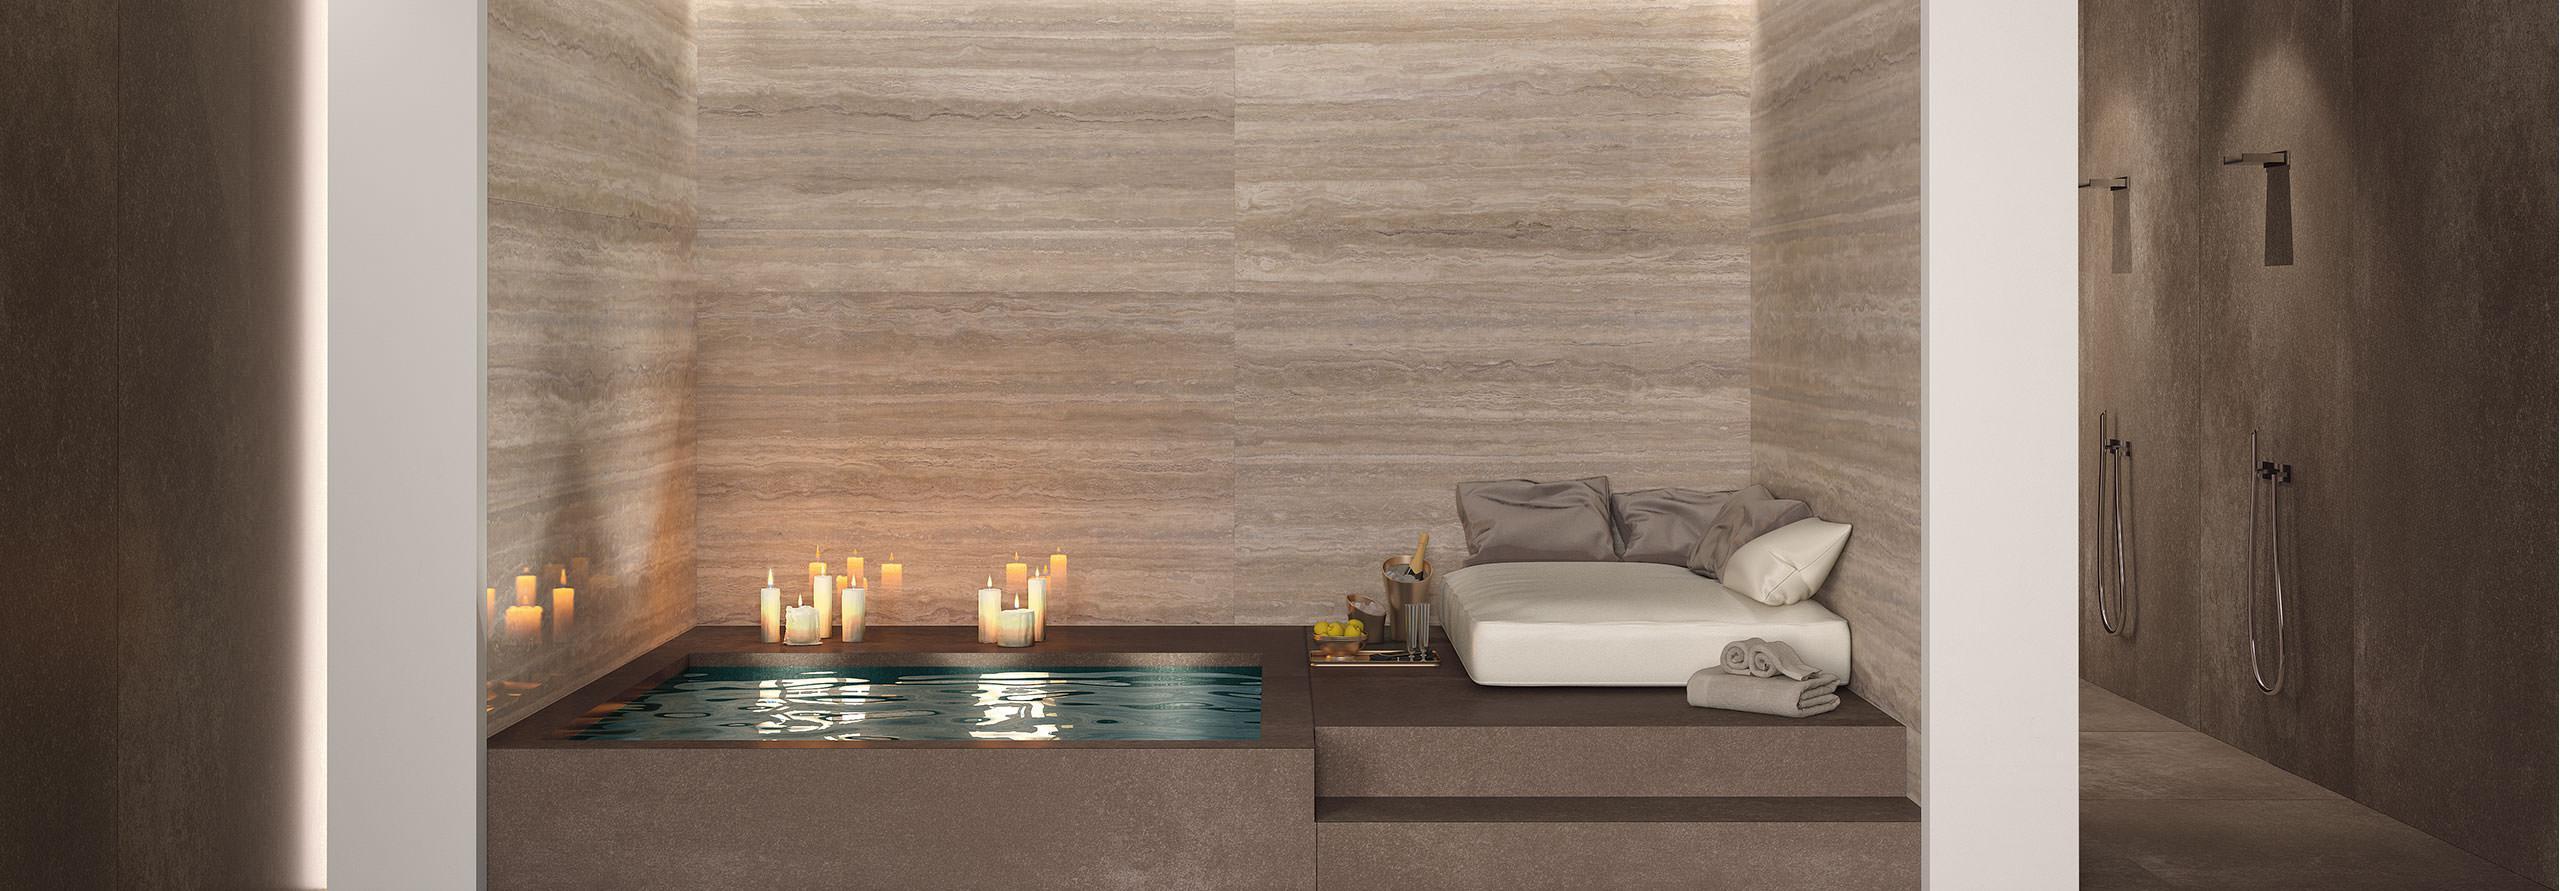 maxfine arabescato maxi slabs pinterest porcelain tile